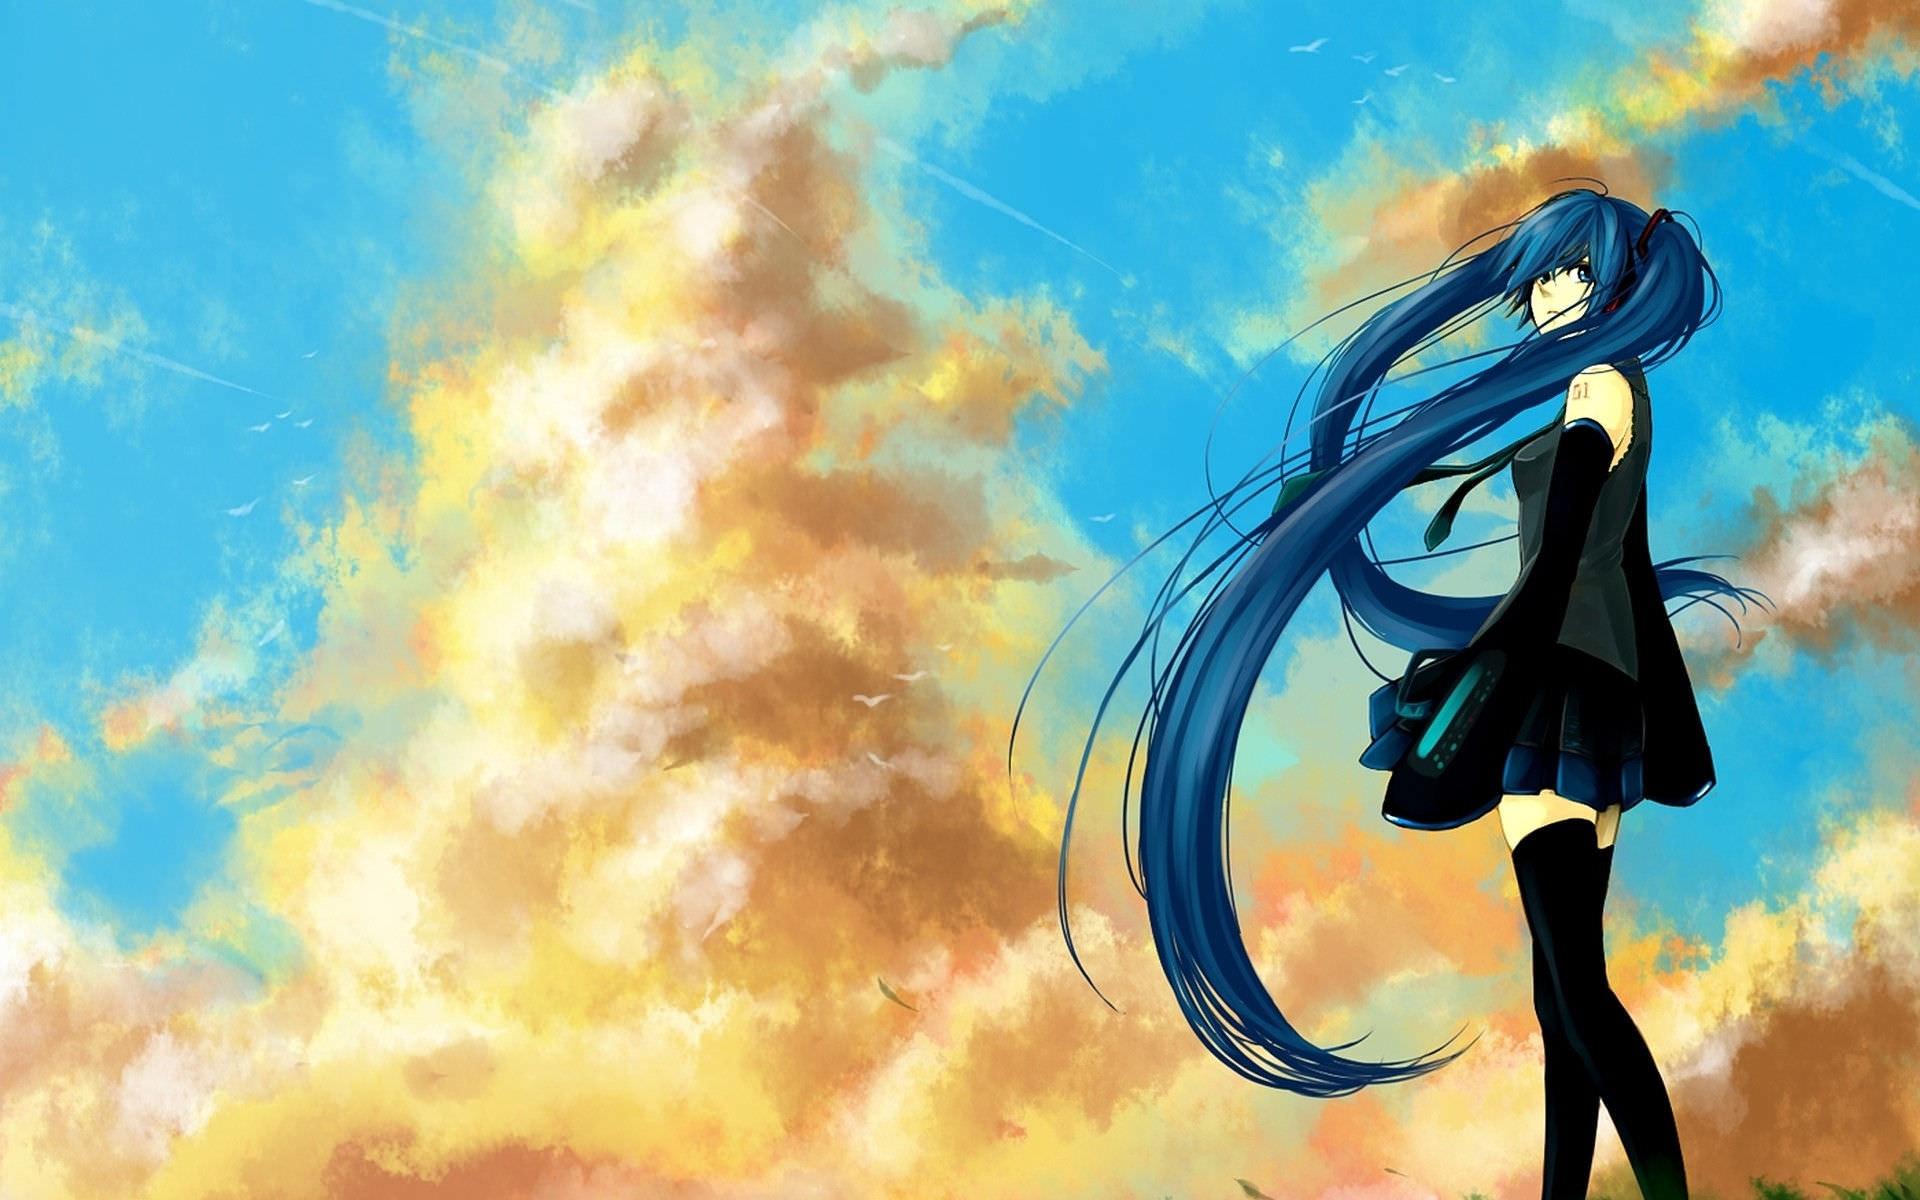 Marvellous Sky Vocaloid Wallpaper